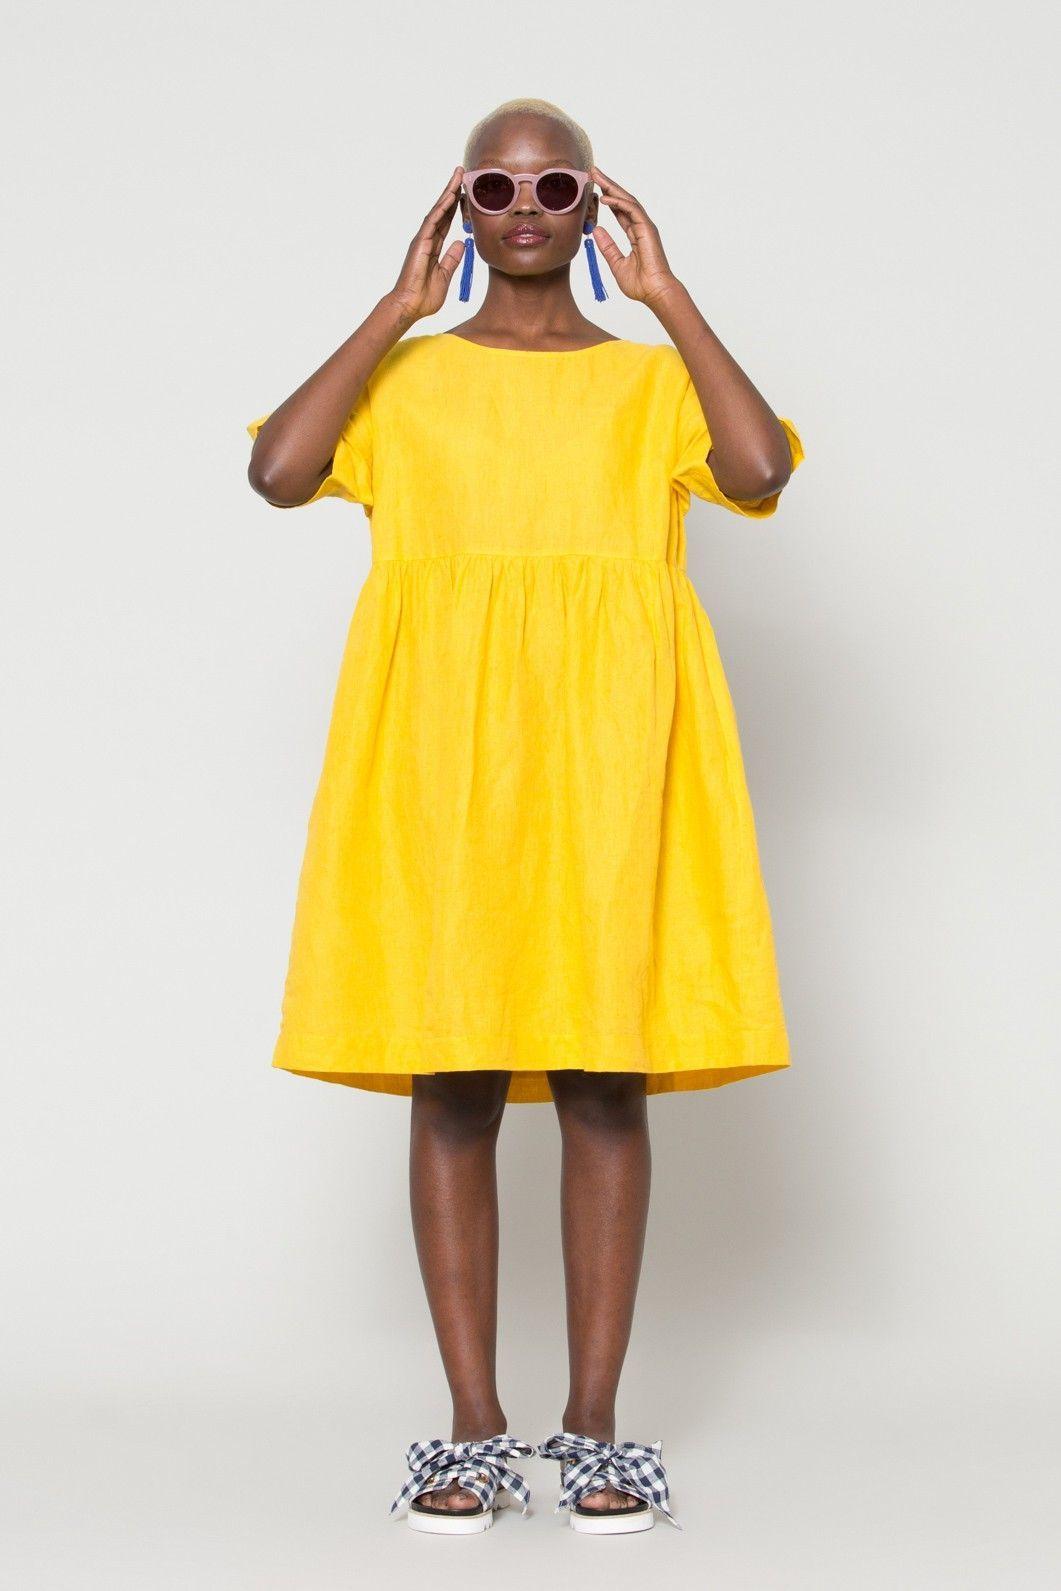 Gorman Summer 18 Collection Lucia Sunglasses Linen Smock Dress Check Mate Sandal Smock Dress Clothes Dresses [ 1591 x 1061 Pixel ]